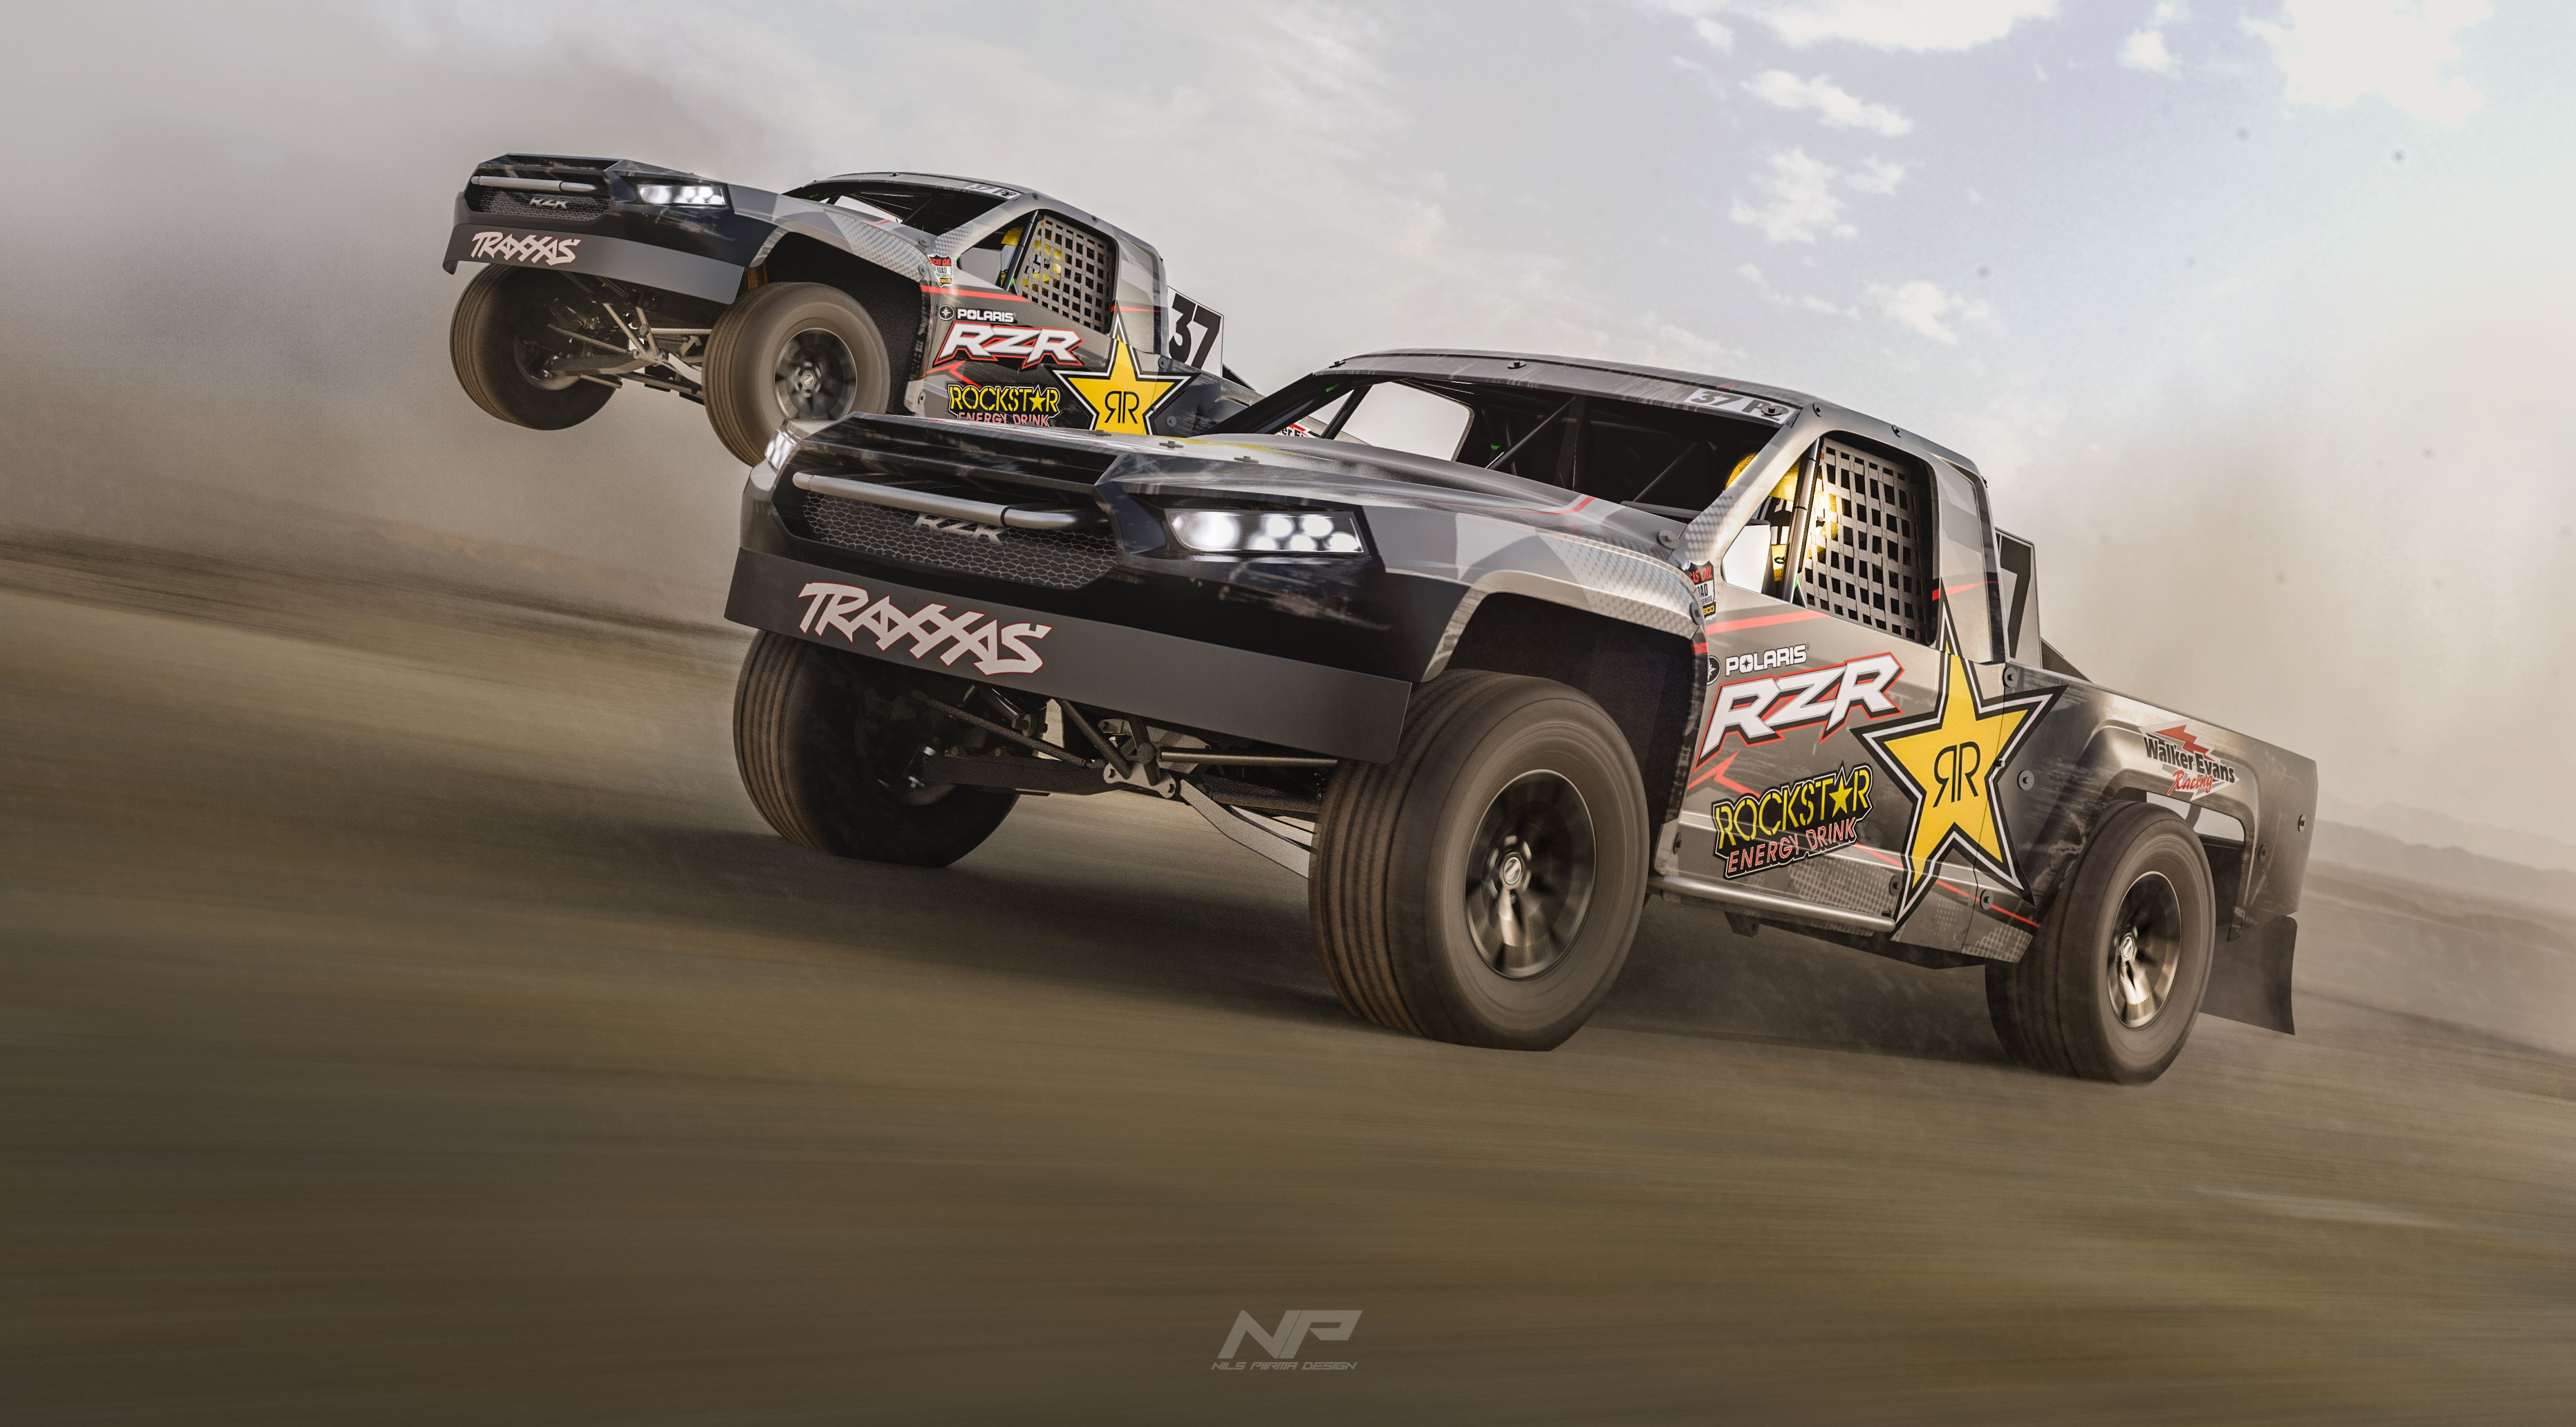 Traxxas Trophy Trucks Racing In The Desert Rendered In Keyshot By Nils Piirma Trophy Truck Trucks Trophy